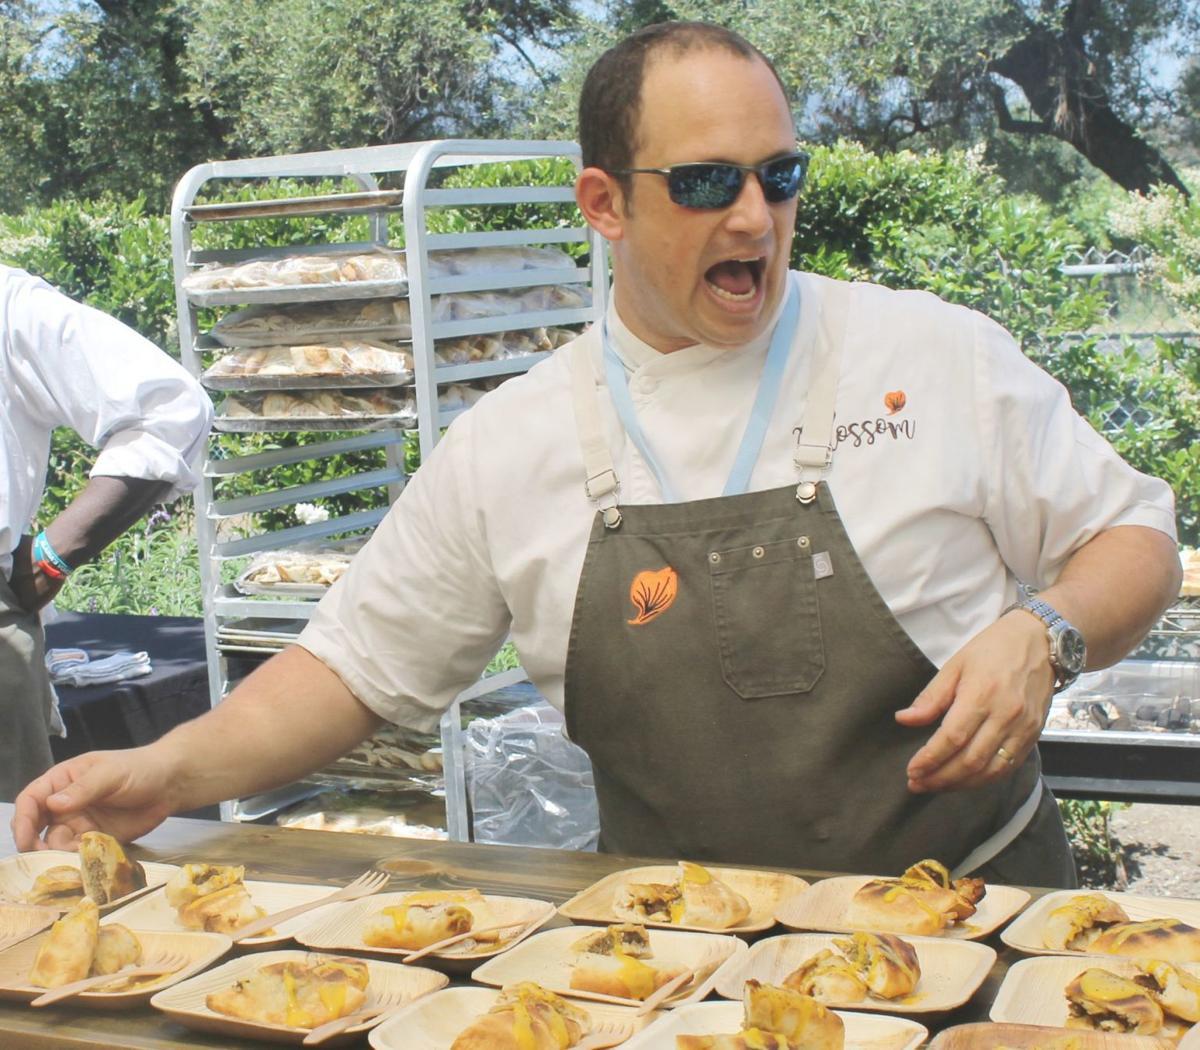 Blossom chef Itamar Abramovitch